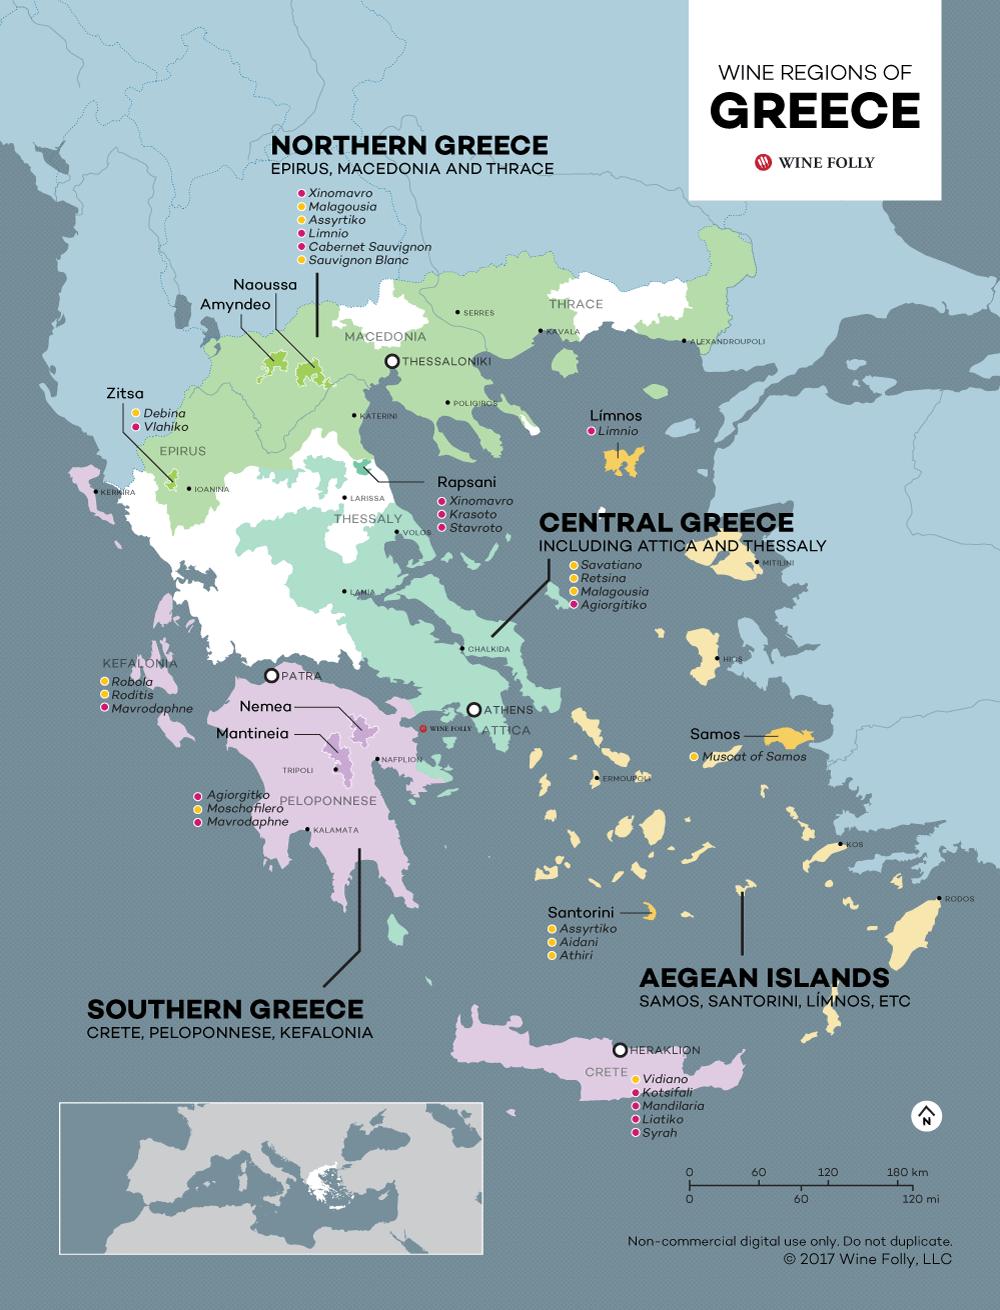 the wine regions of